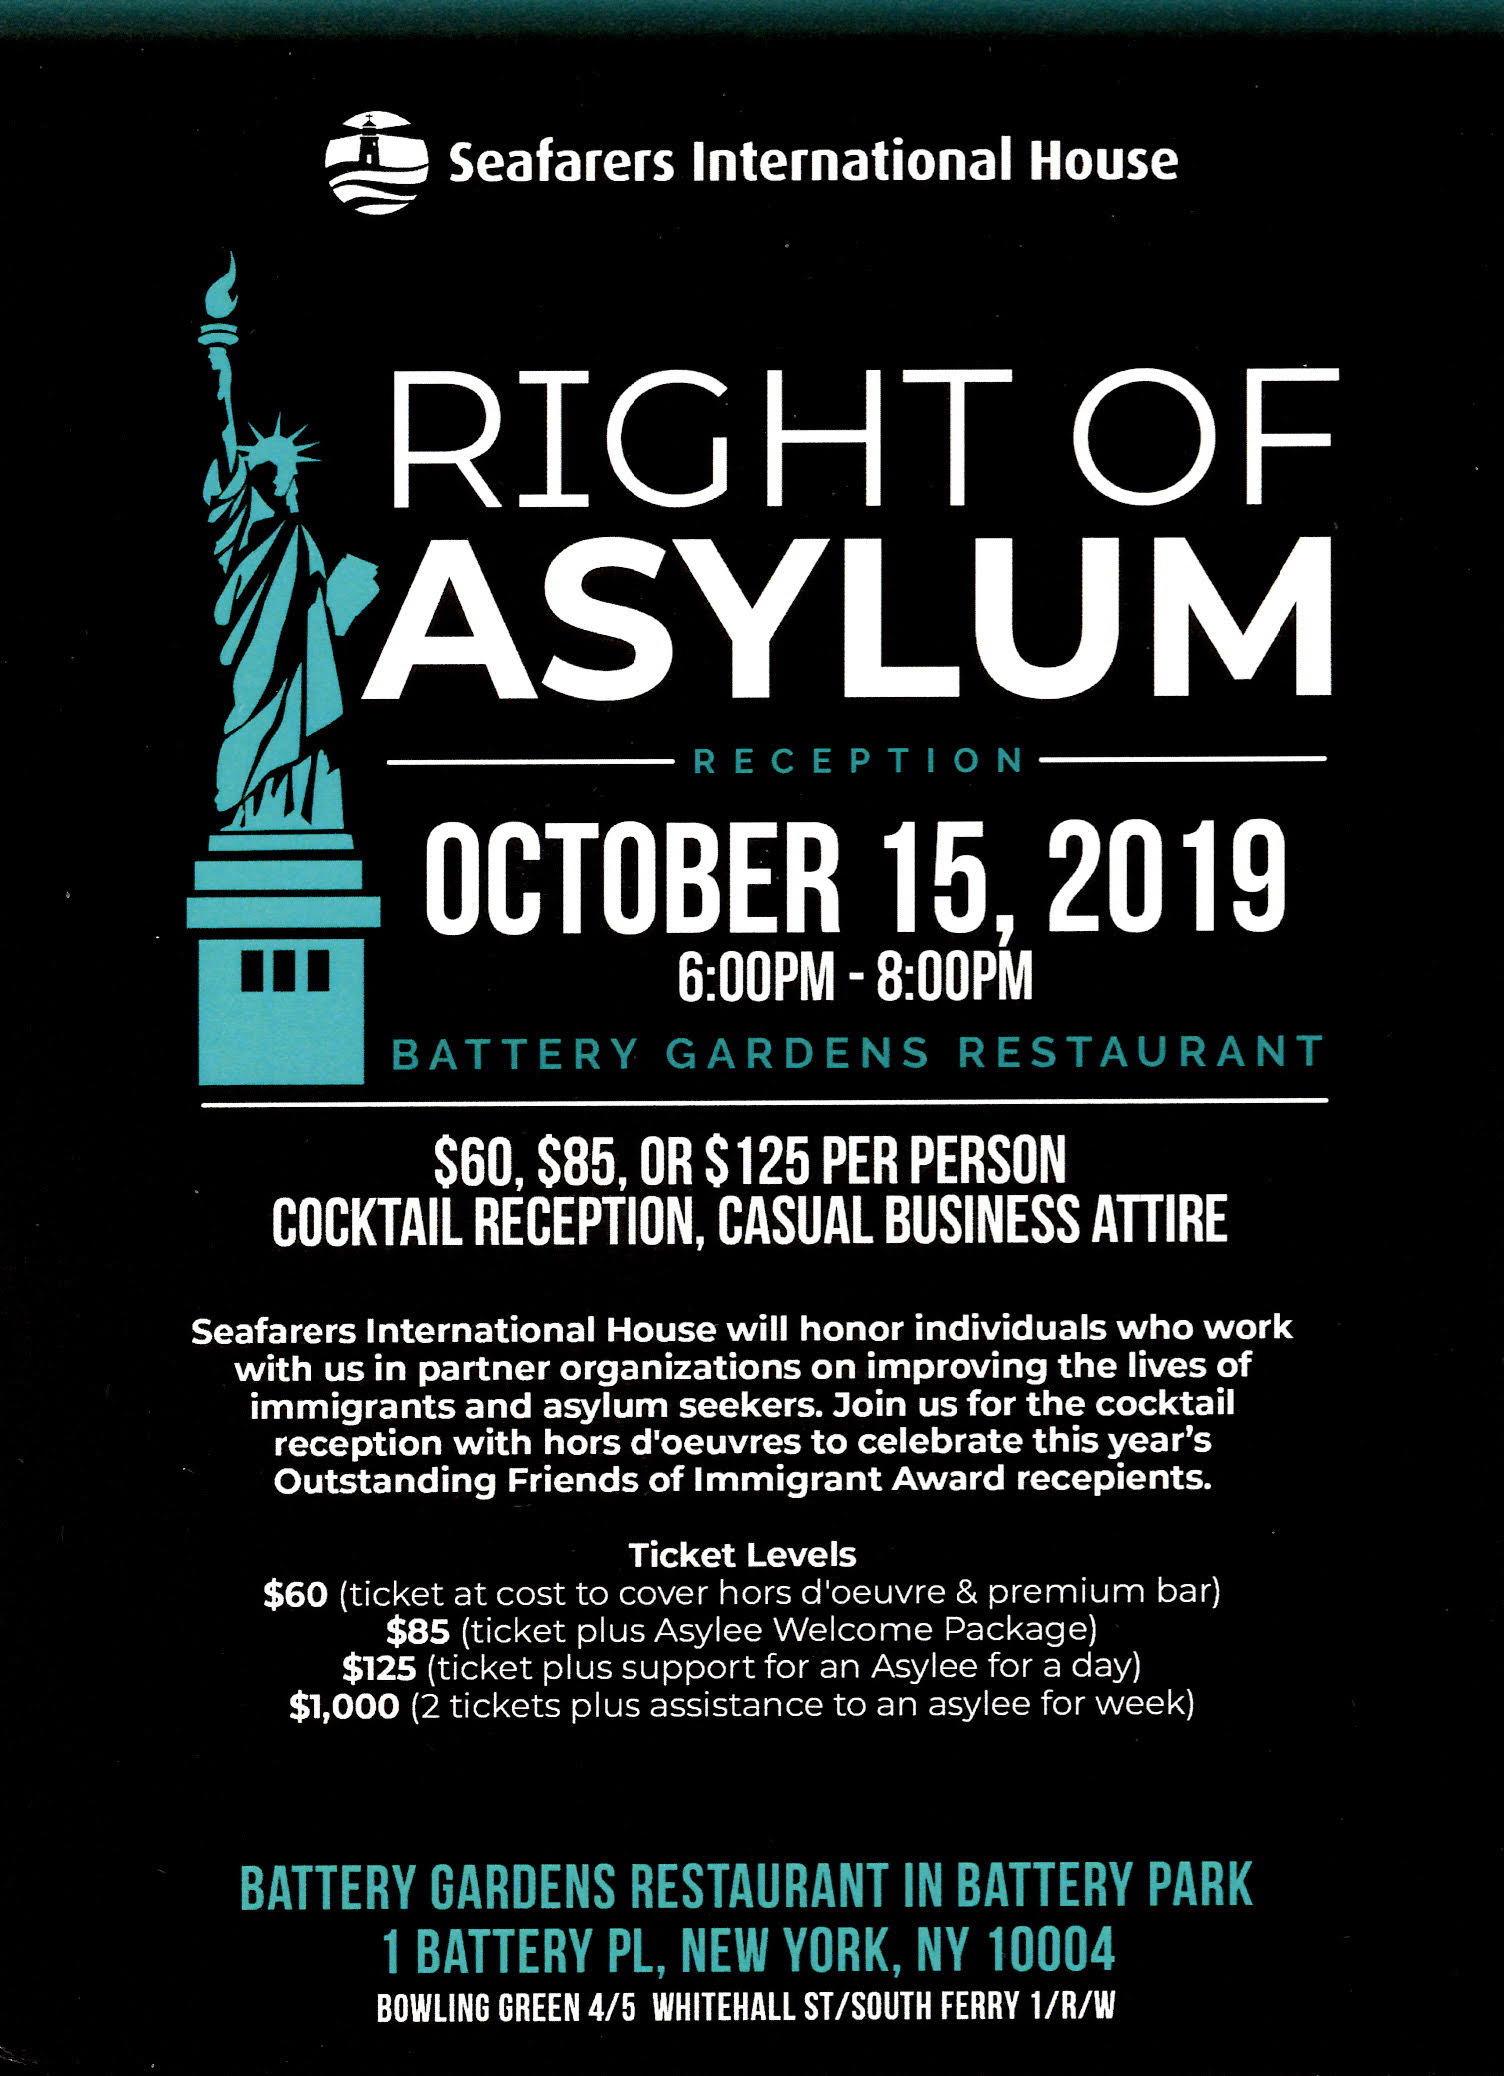 Right_of_Asylum_event.jpg